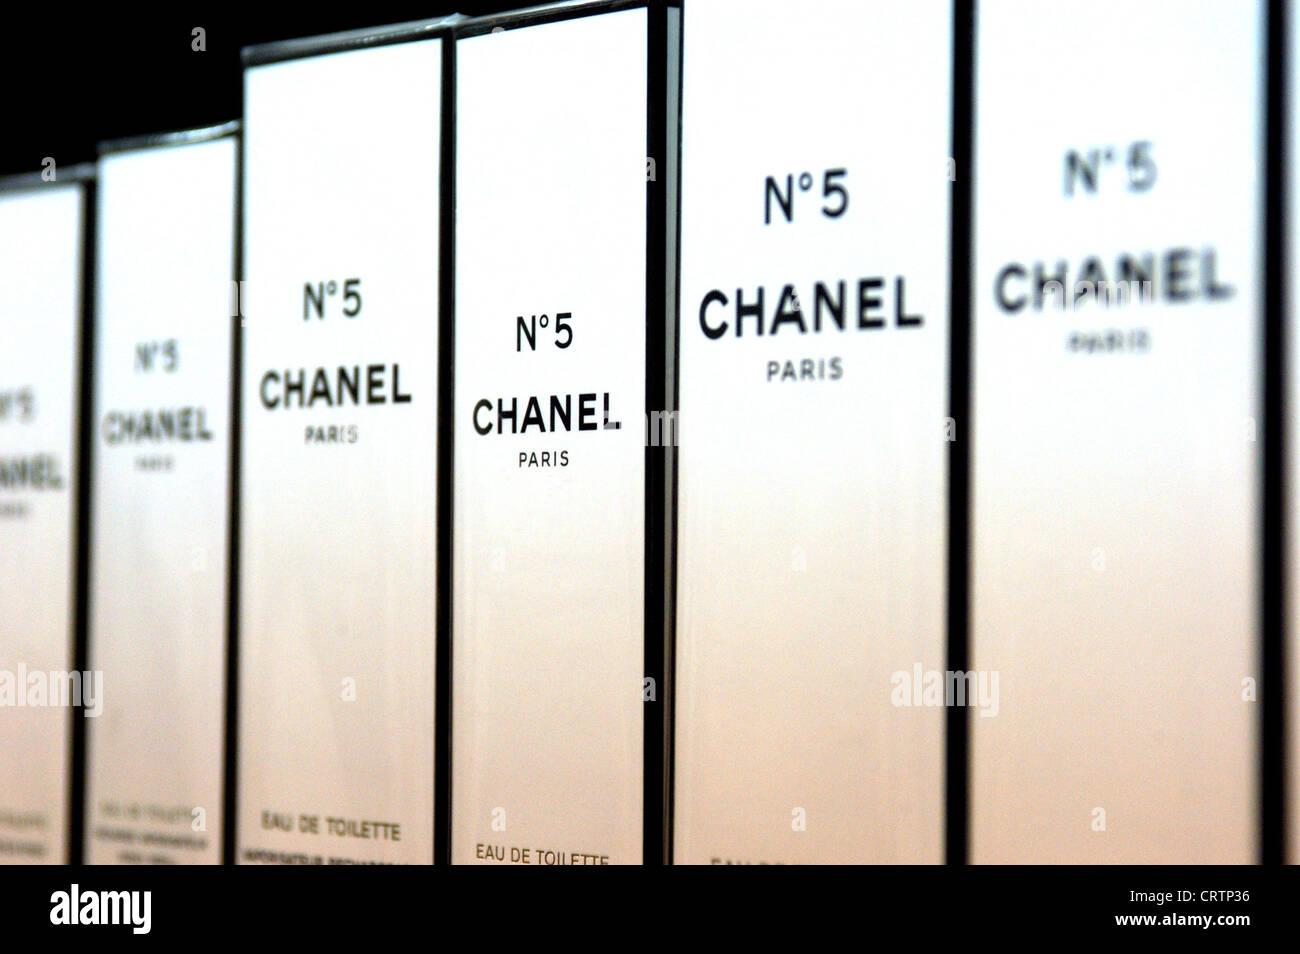 Chanel Berlin berlin boxes of perfume chanel no 5 stock photo 49102010 alamy